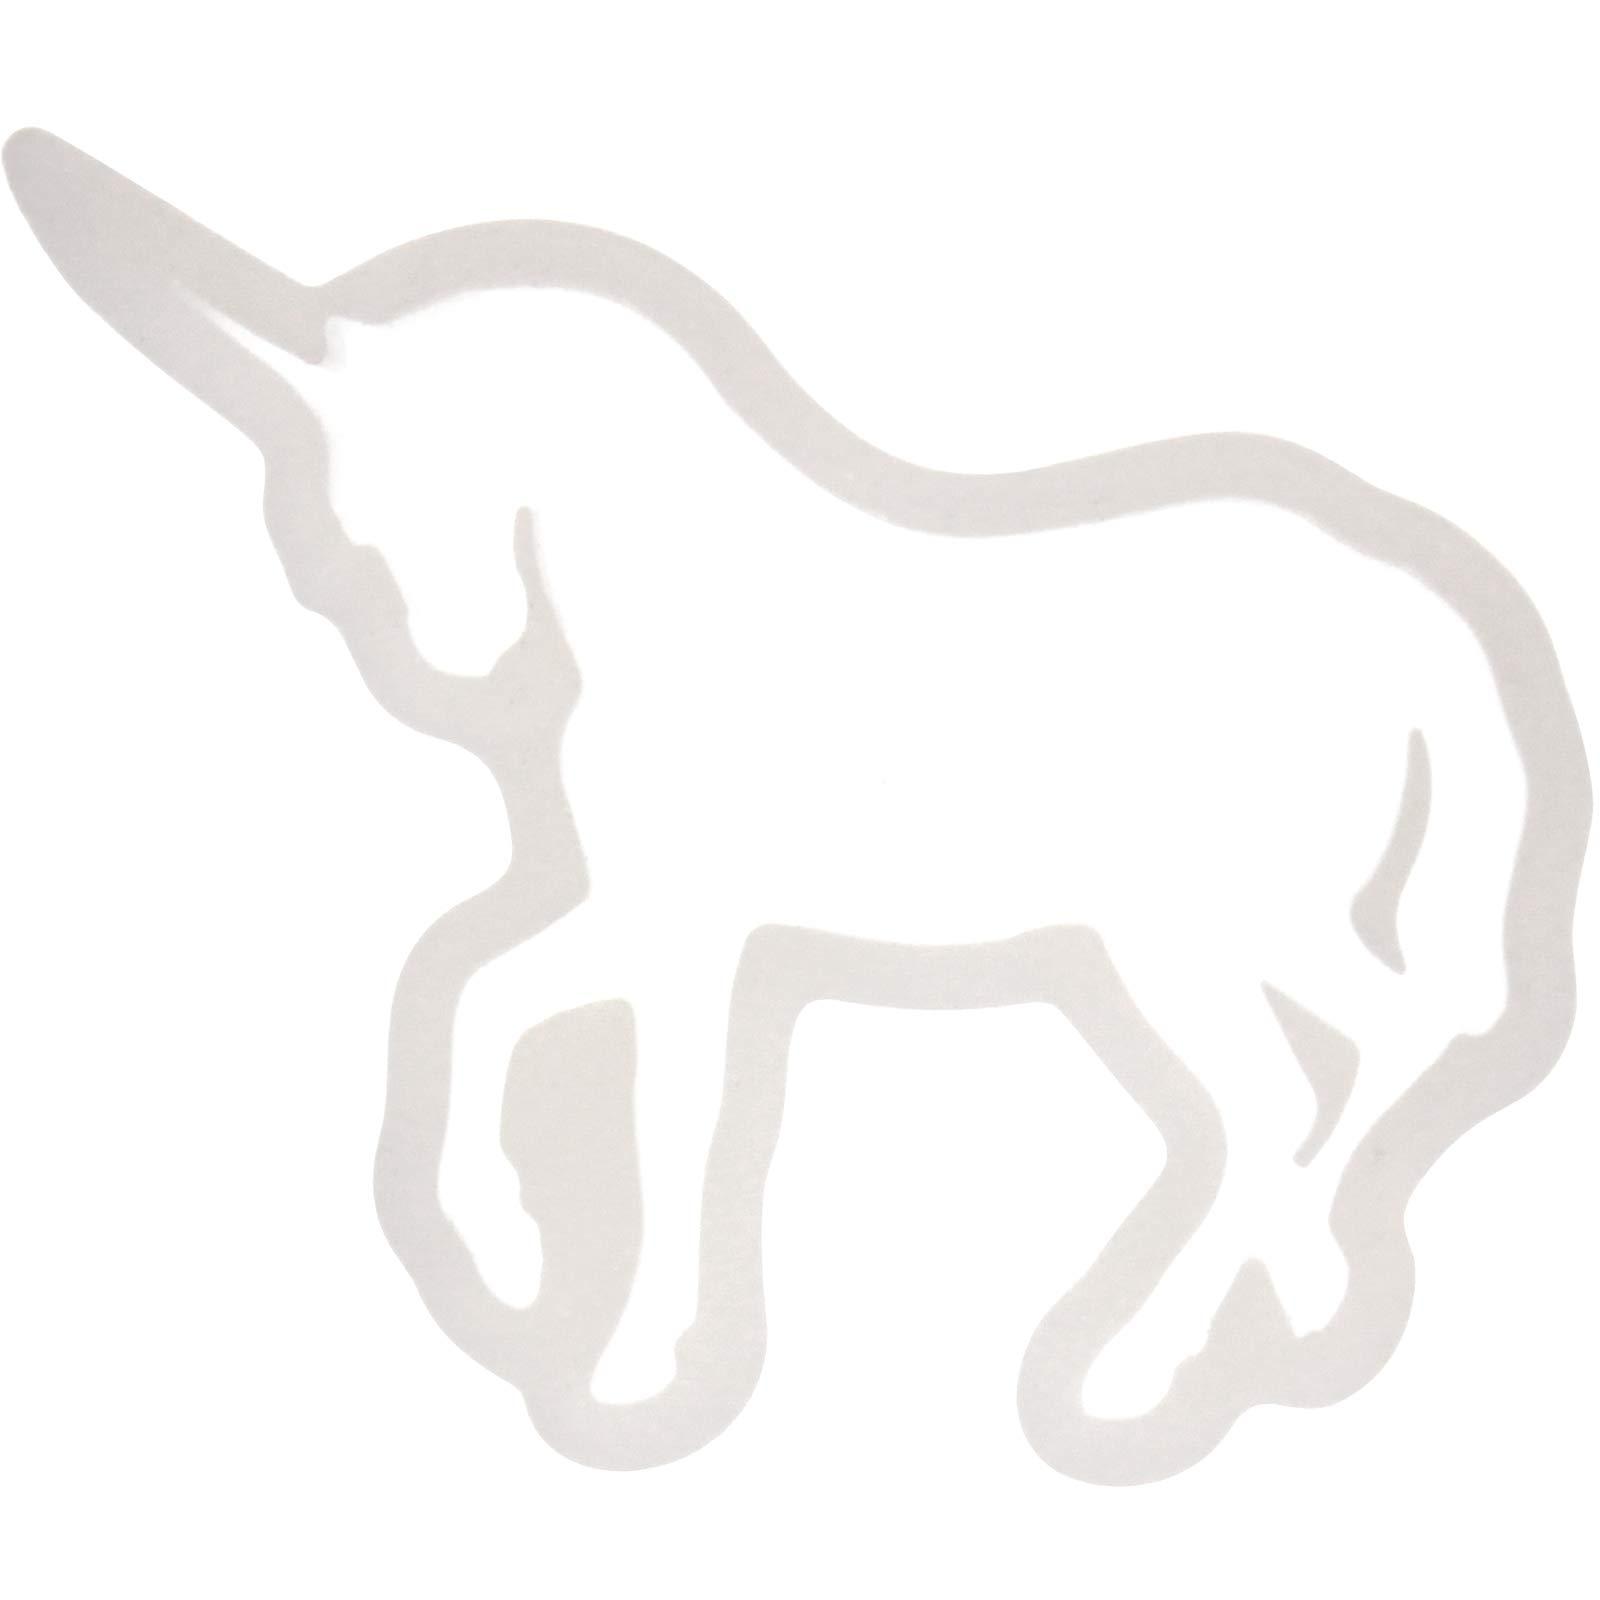 Funshowcase Cute Unicorn Silicone Mold Trays for Crafting, Resin Epoxy, Jewelry Making